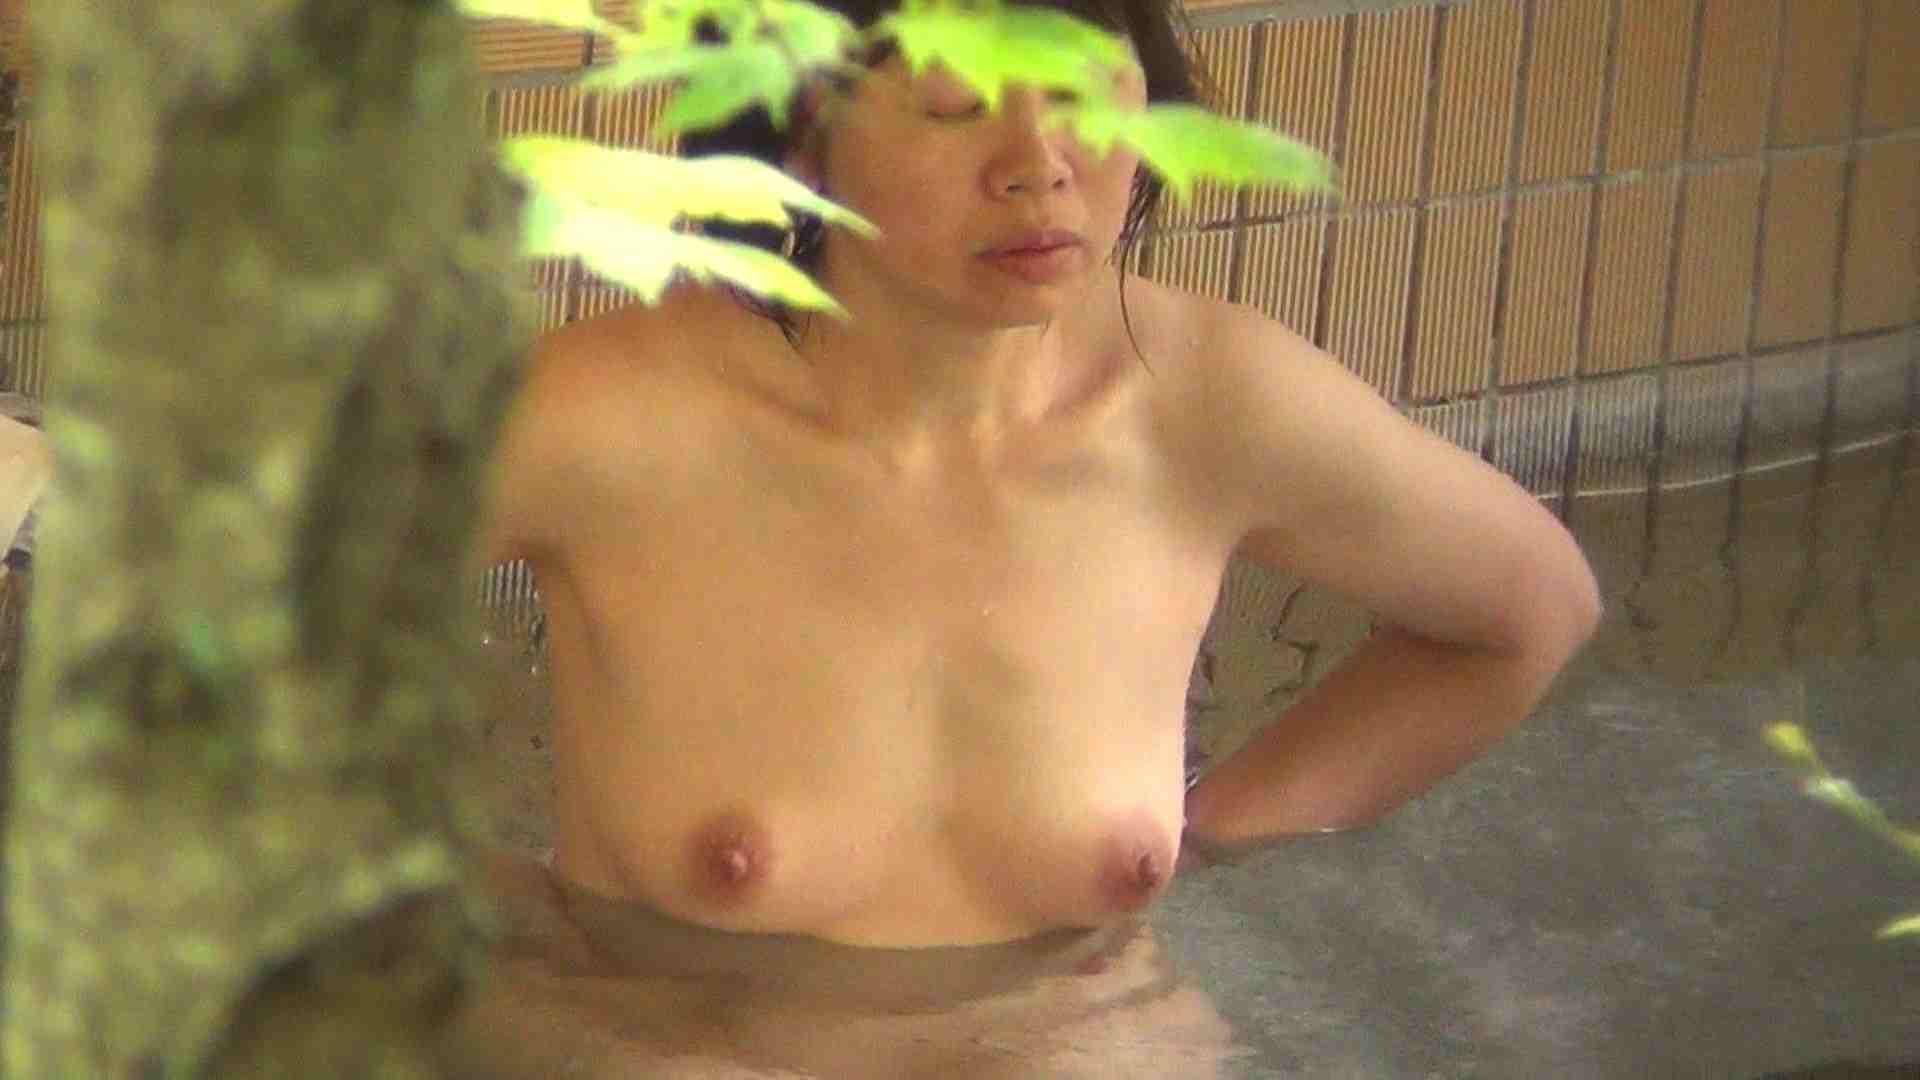 Aquaな露天風呂Vol.247 盗撮 AV無料 82枚 41